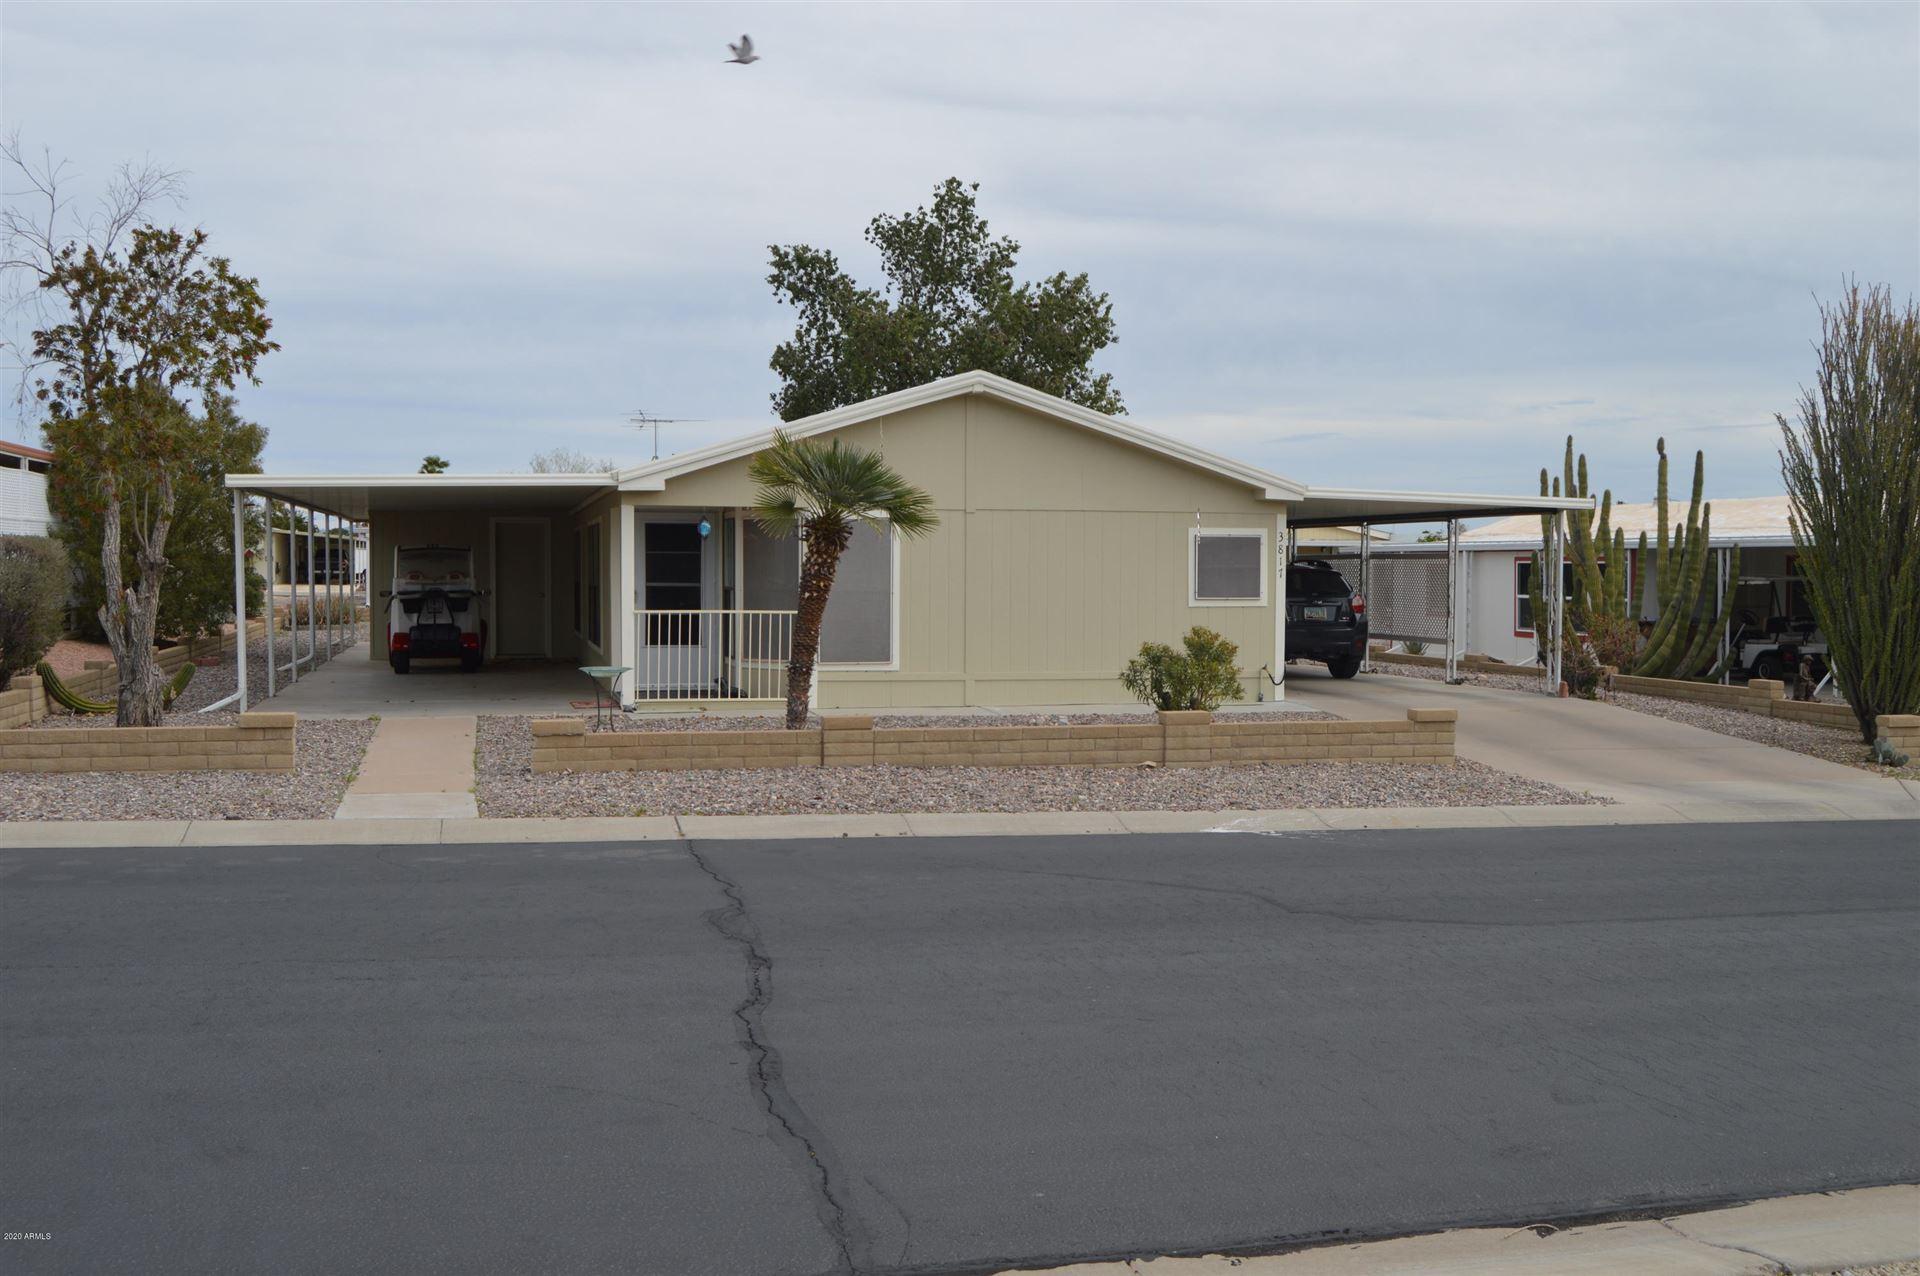 3817 N MINNESOTA Avenue, Florence, AZ 85132 - MLS#: 6040194